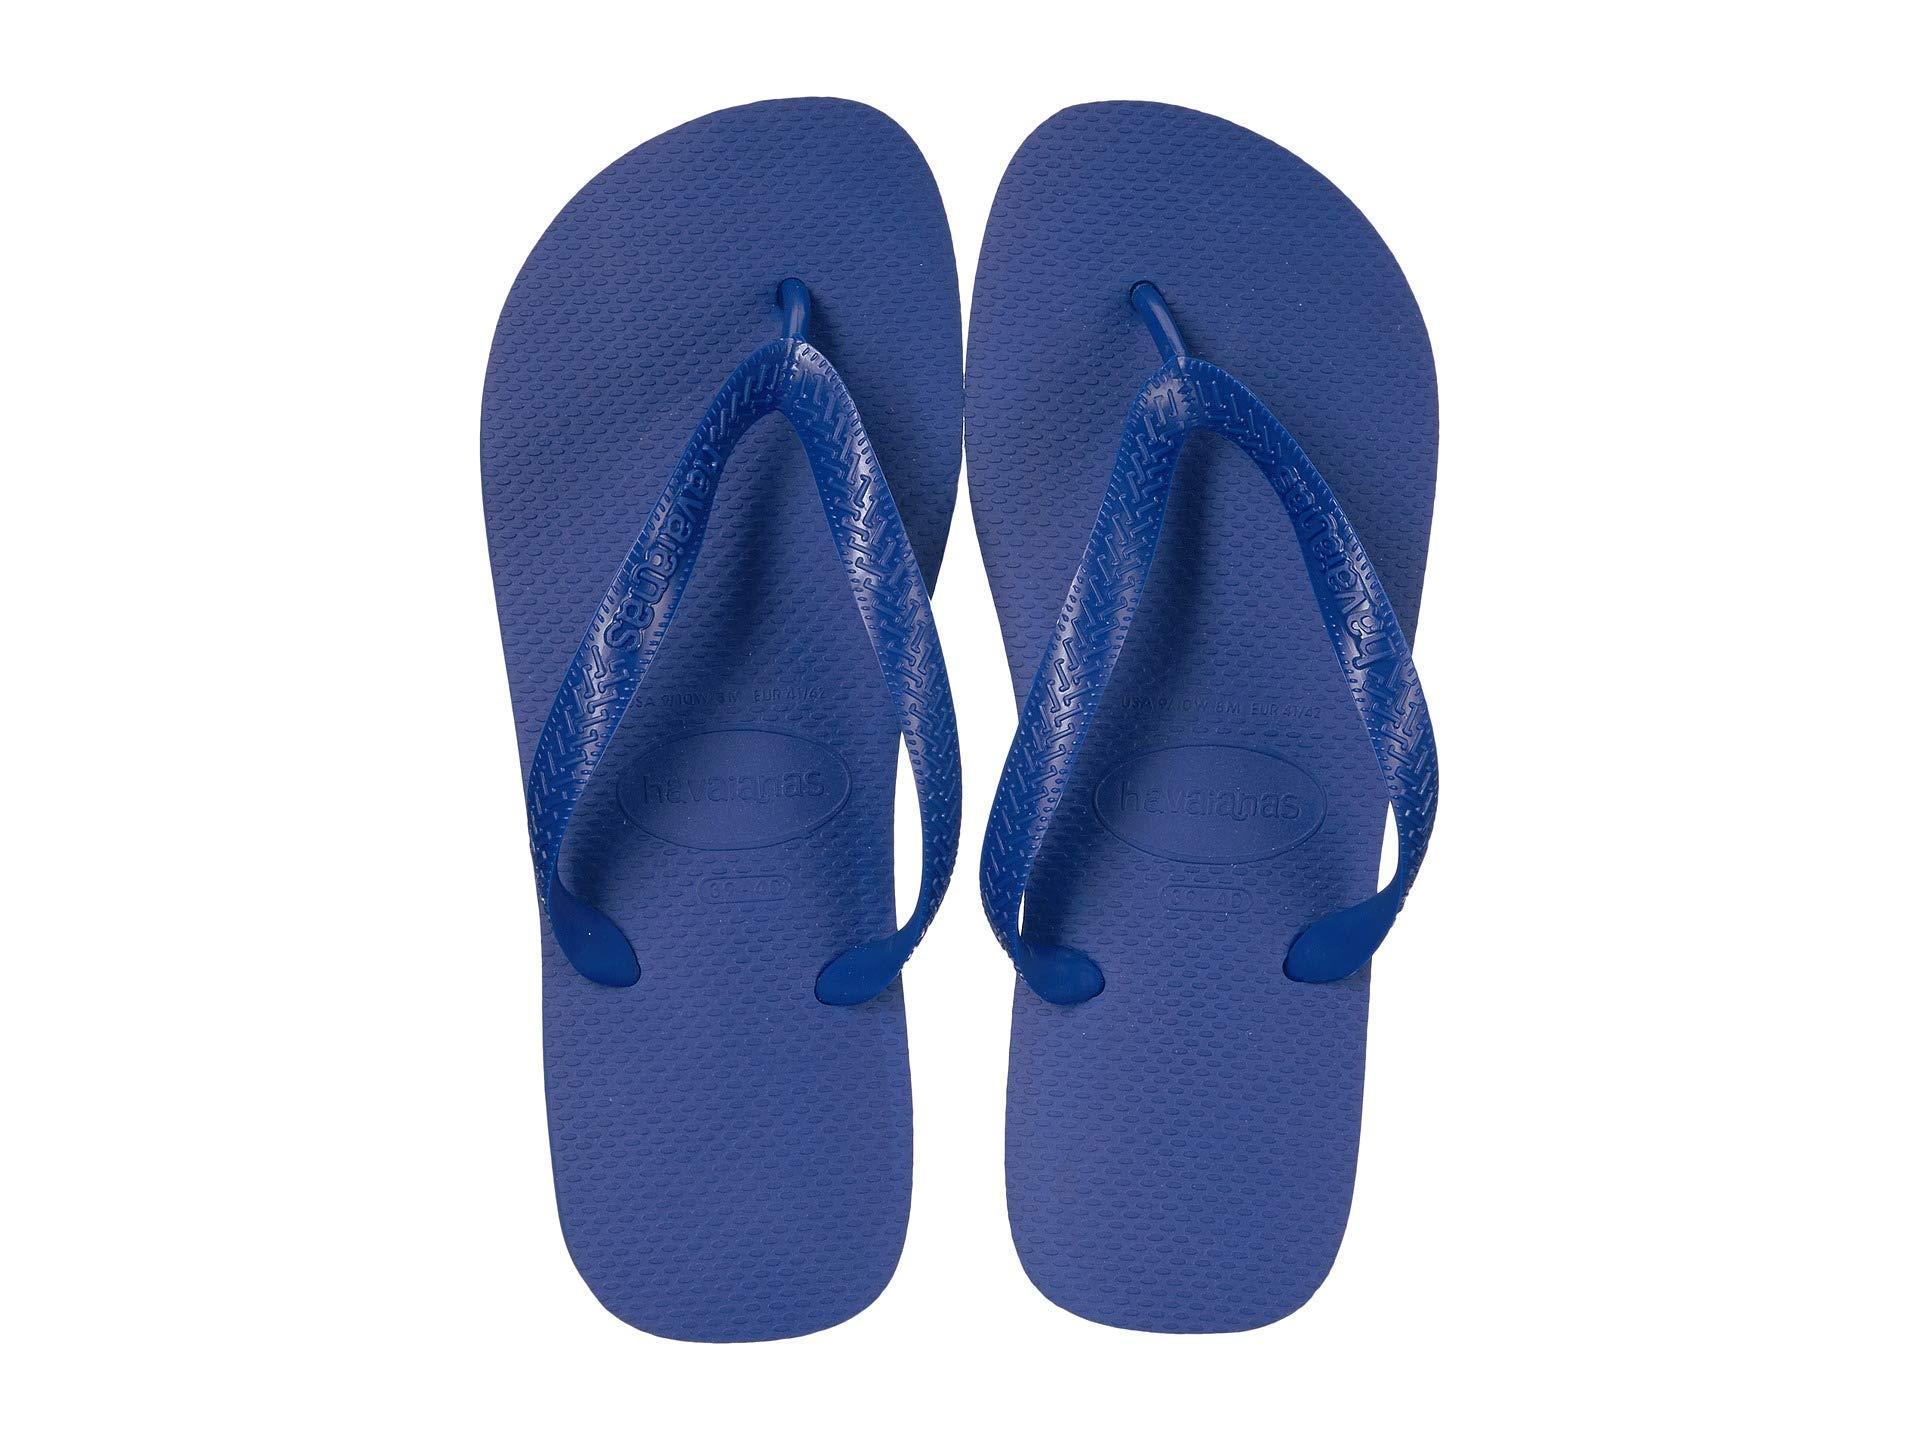 0145b56b7 Lyst - Havaianas Top Flip Flops (hollywood Rose) Women s Sandals in Blue